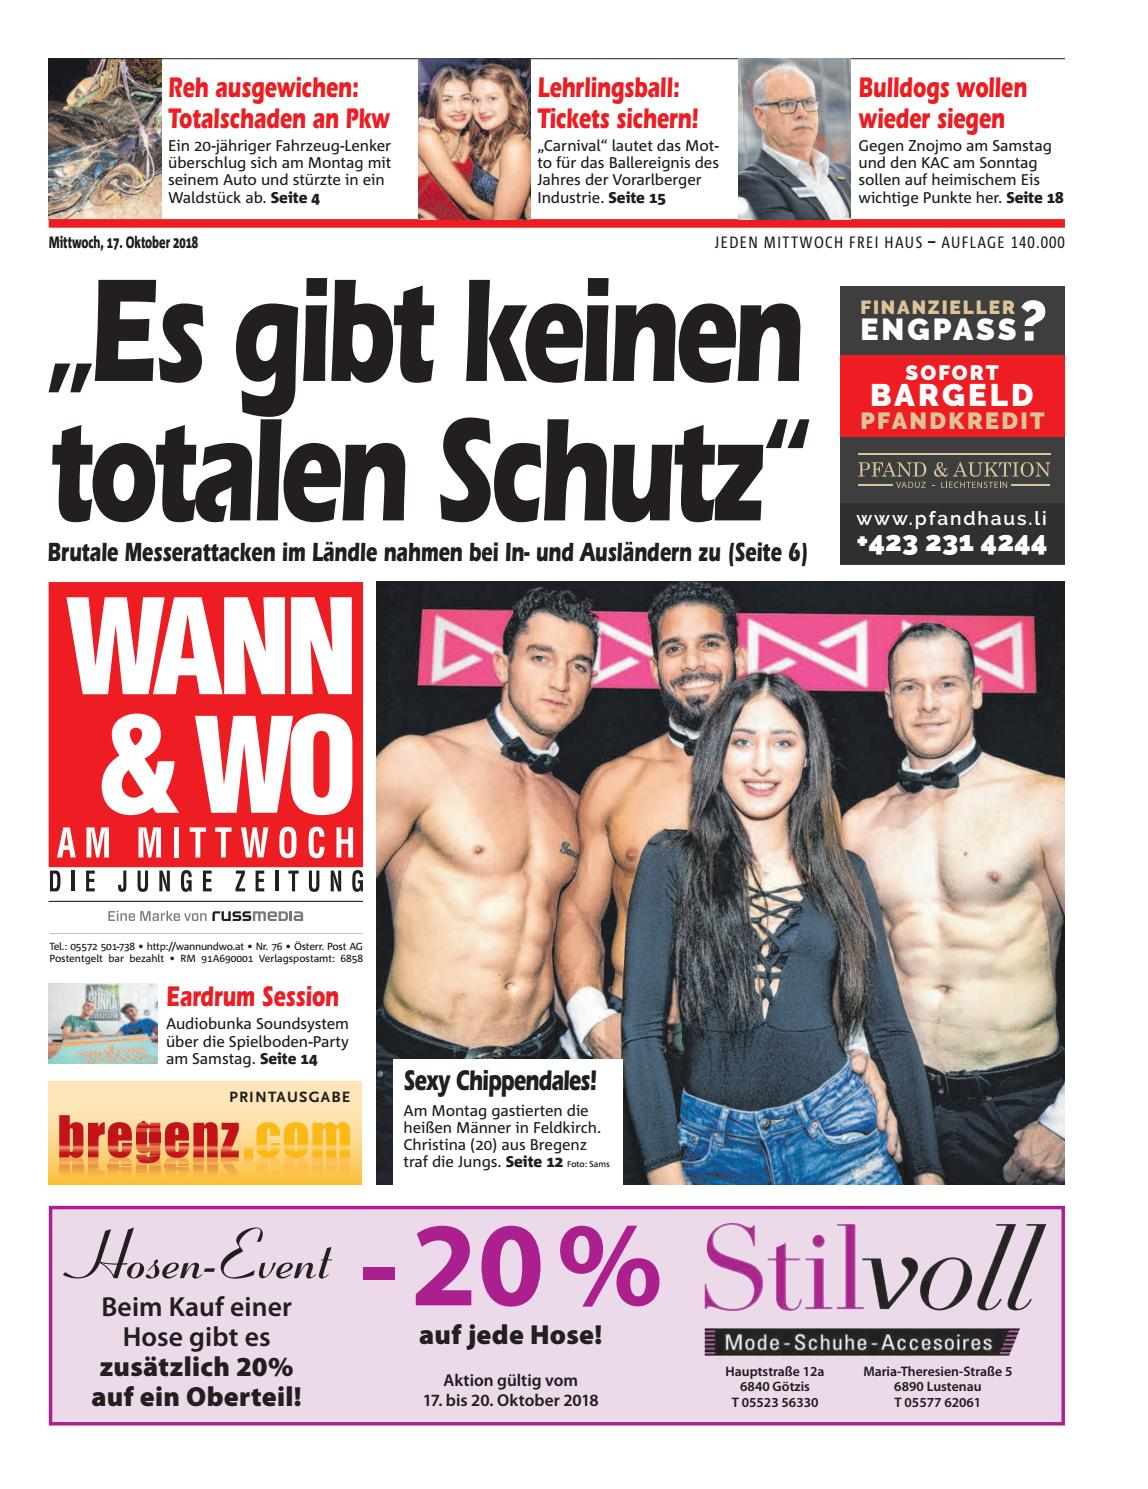 Singles Feldkirch, Kontaktanzeigen aus Feldkirch bei